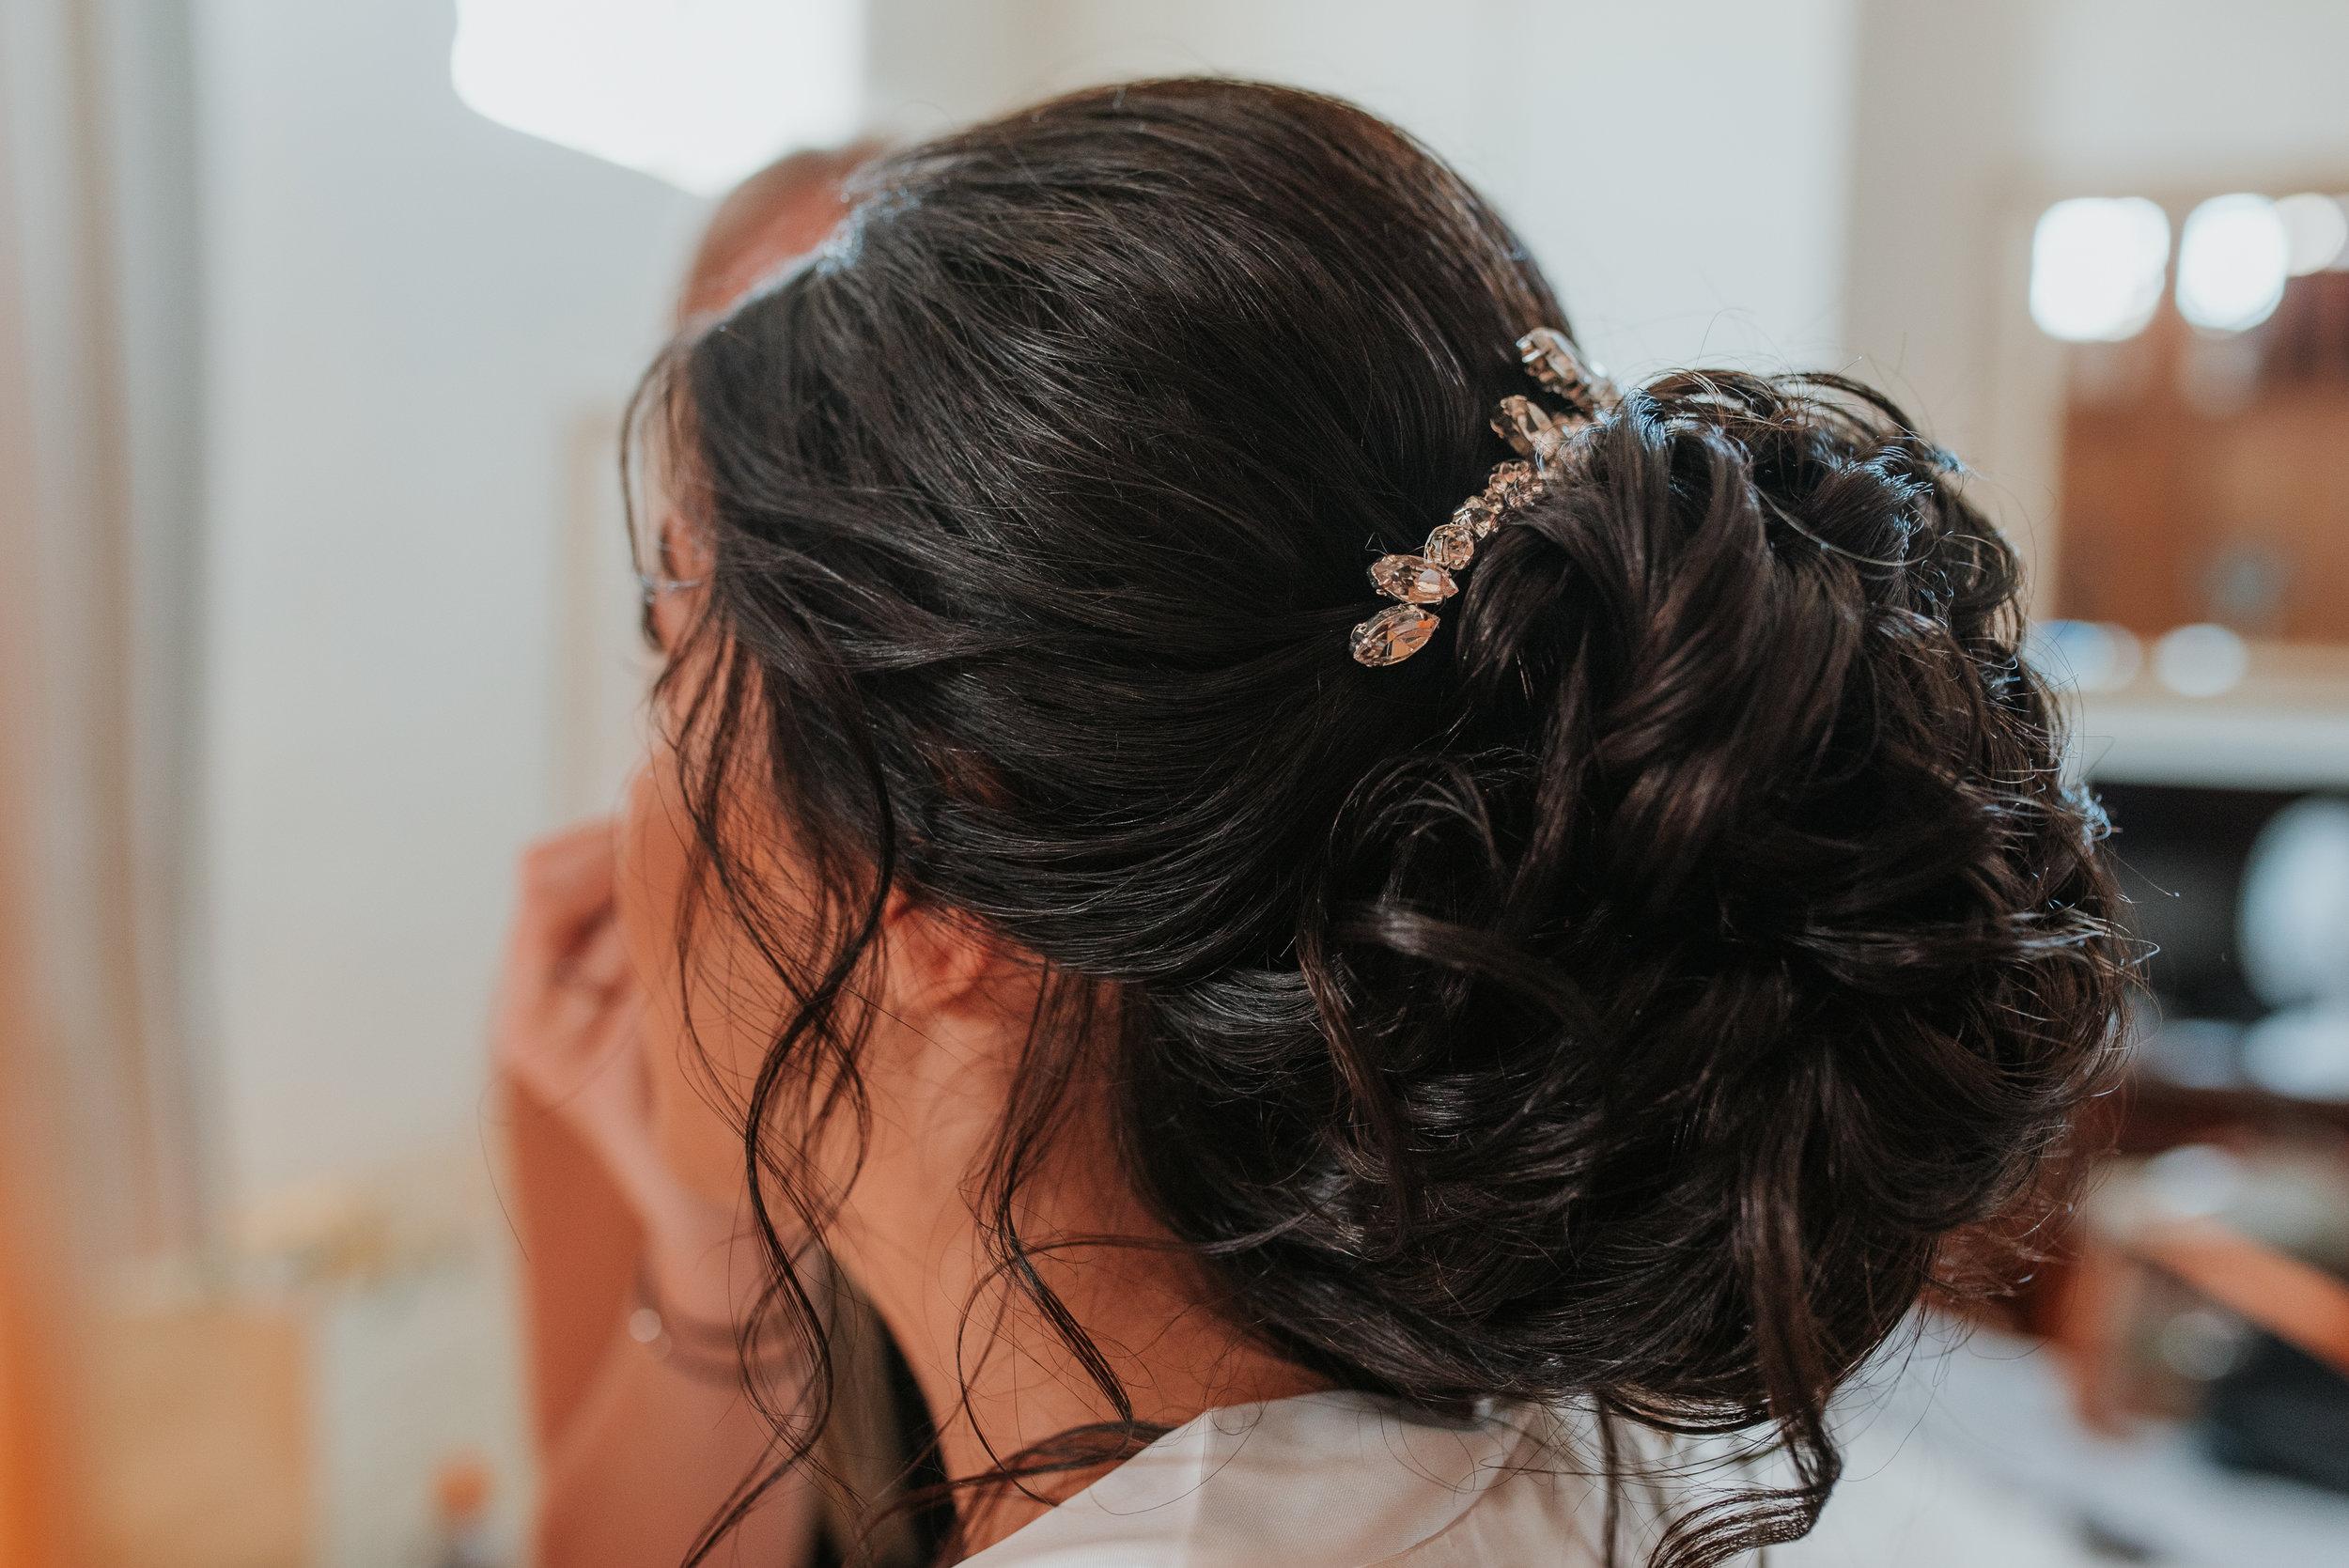 Oxfordshire-wedding-photographer-21.jpg